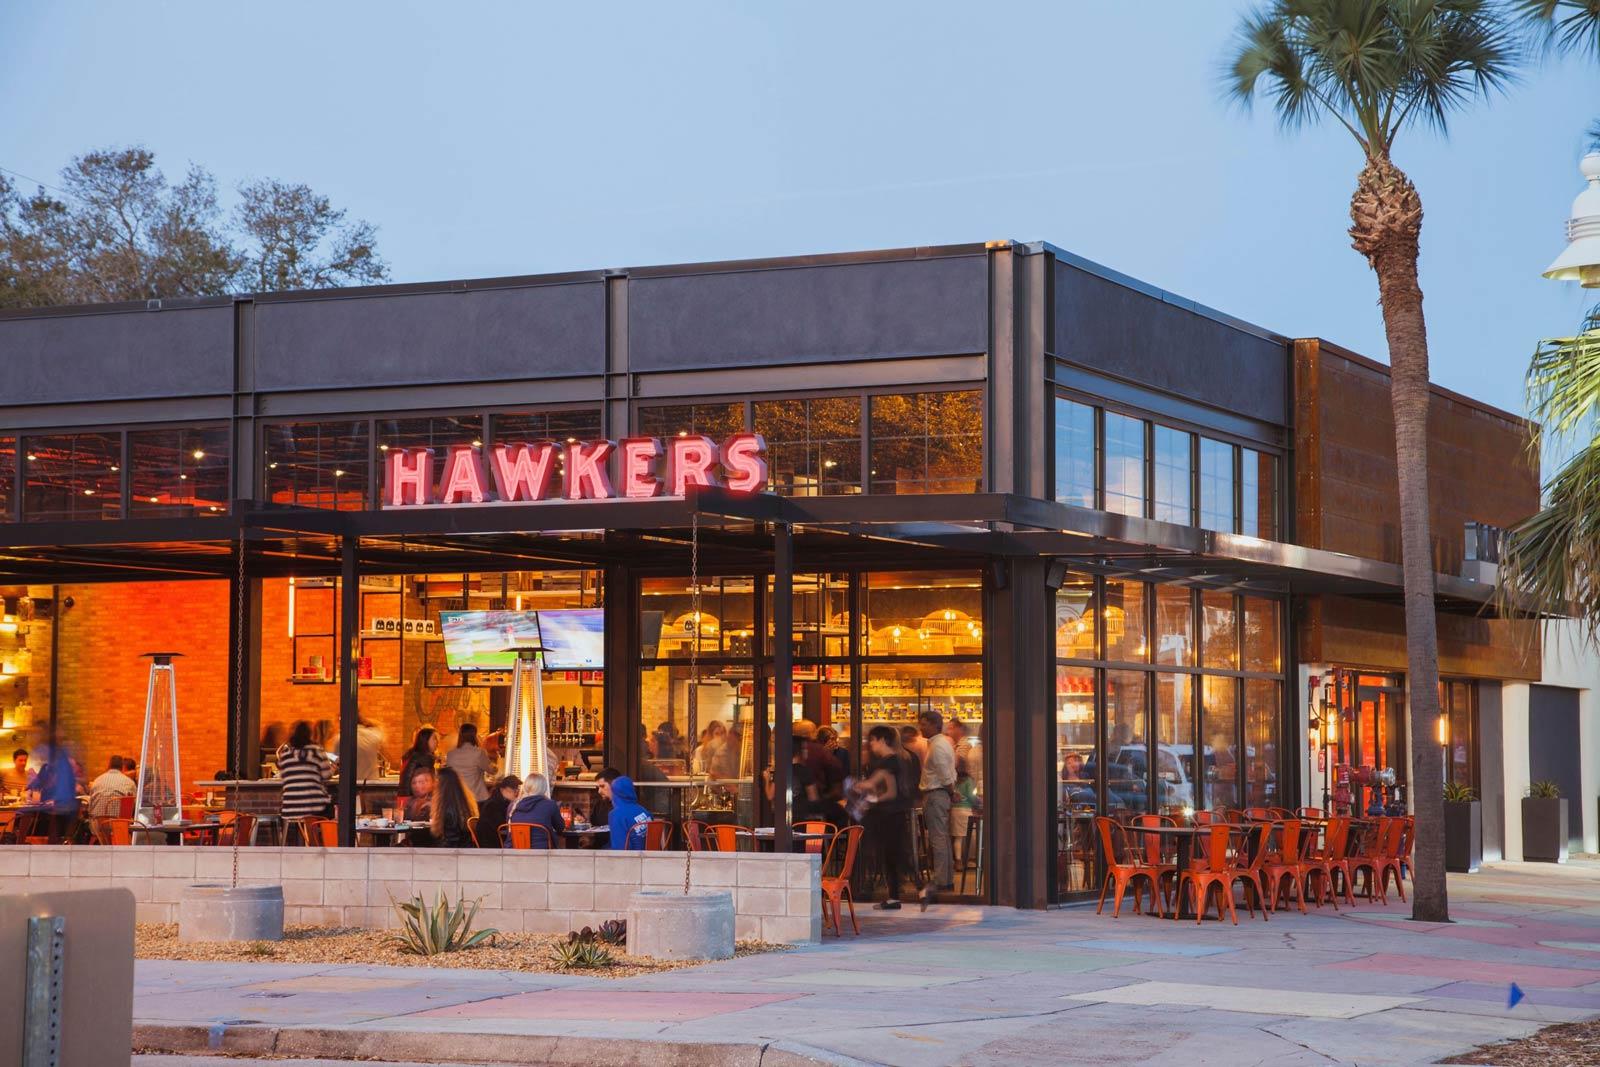 hawkers exterior building